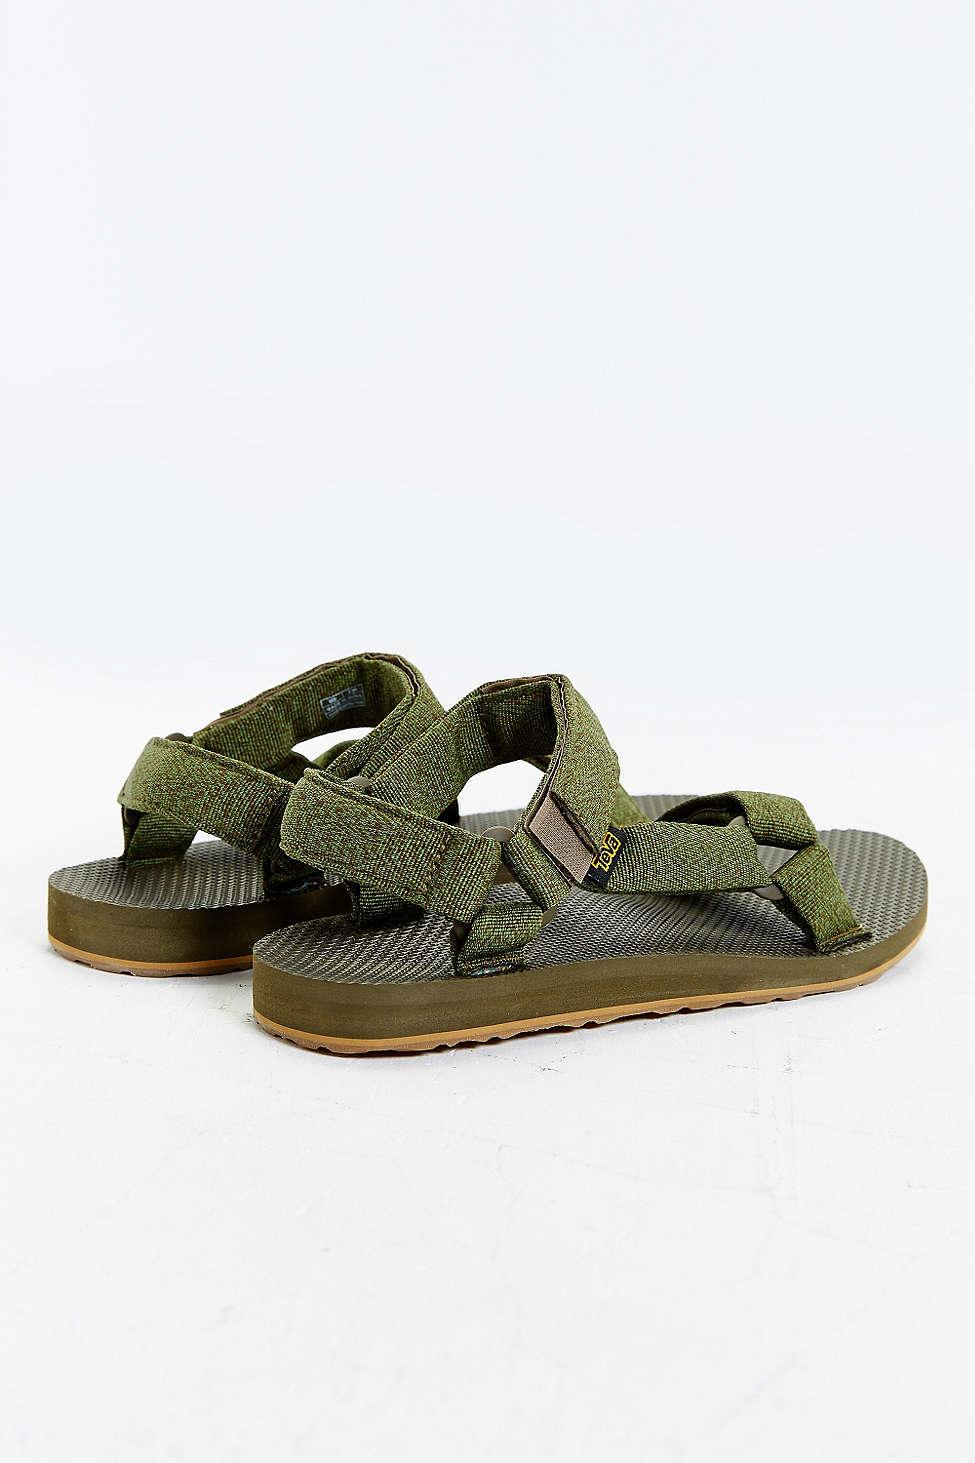 0e4a1a820e2c26 Lyst - Teva Original Universal Urban Men s Sandals in Green for Men